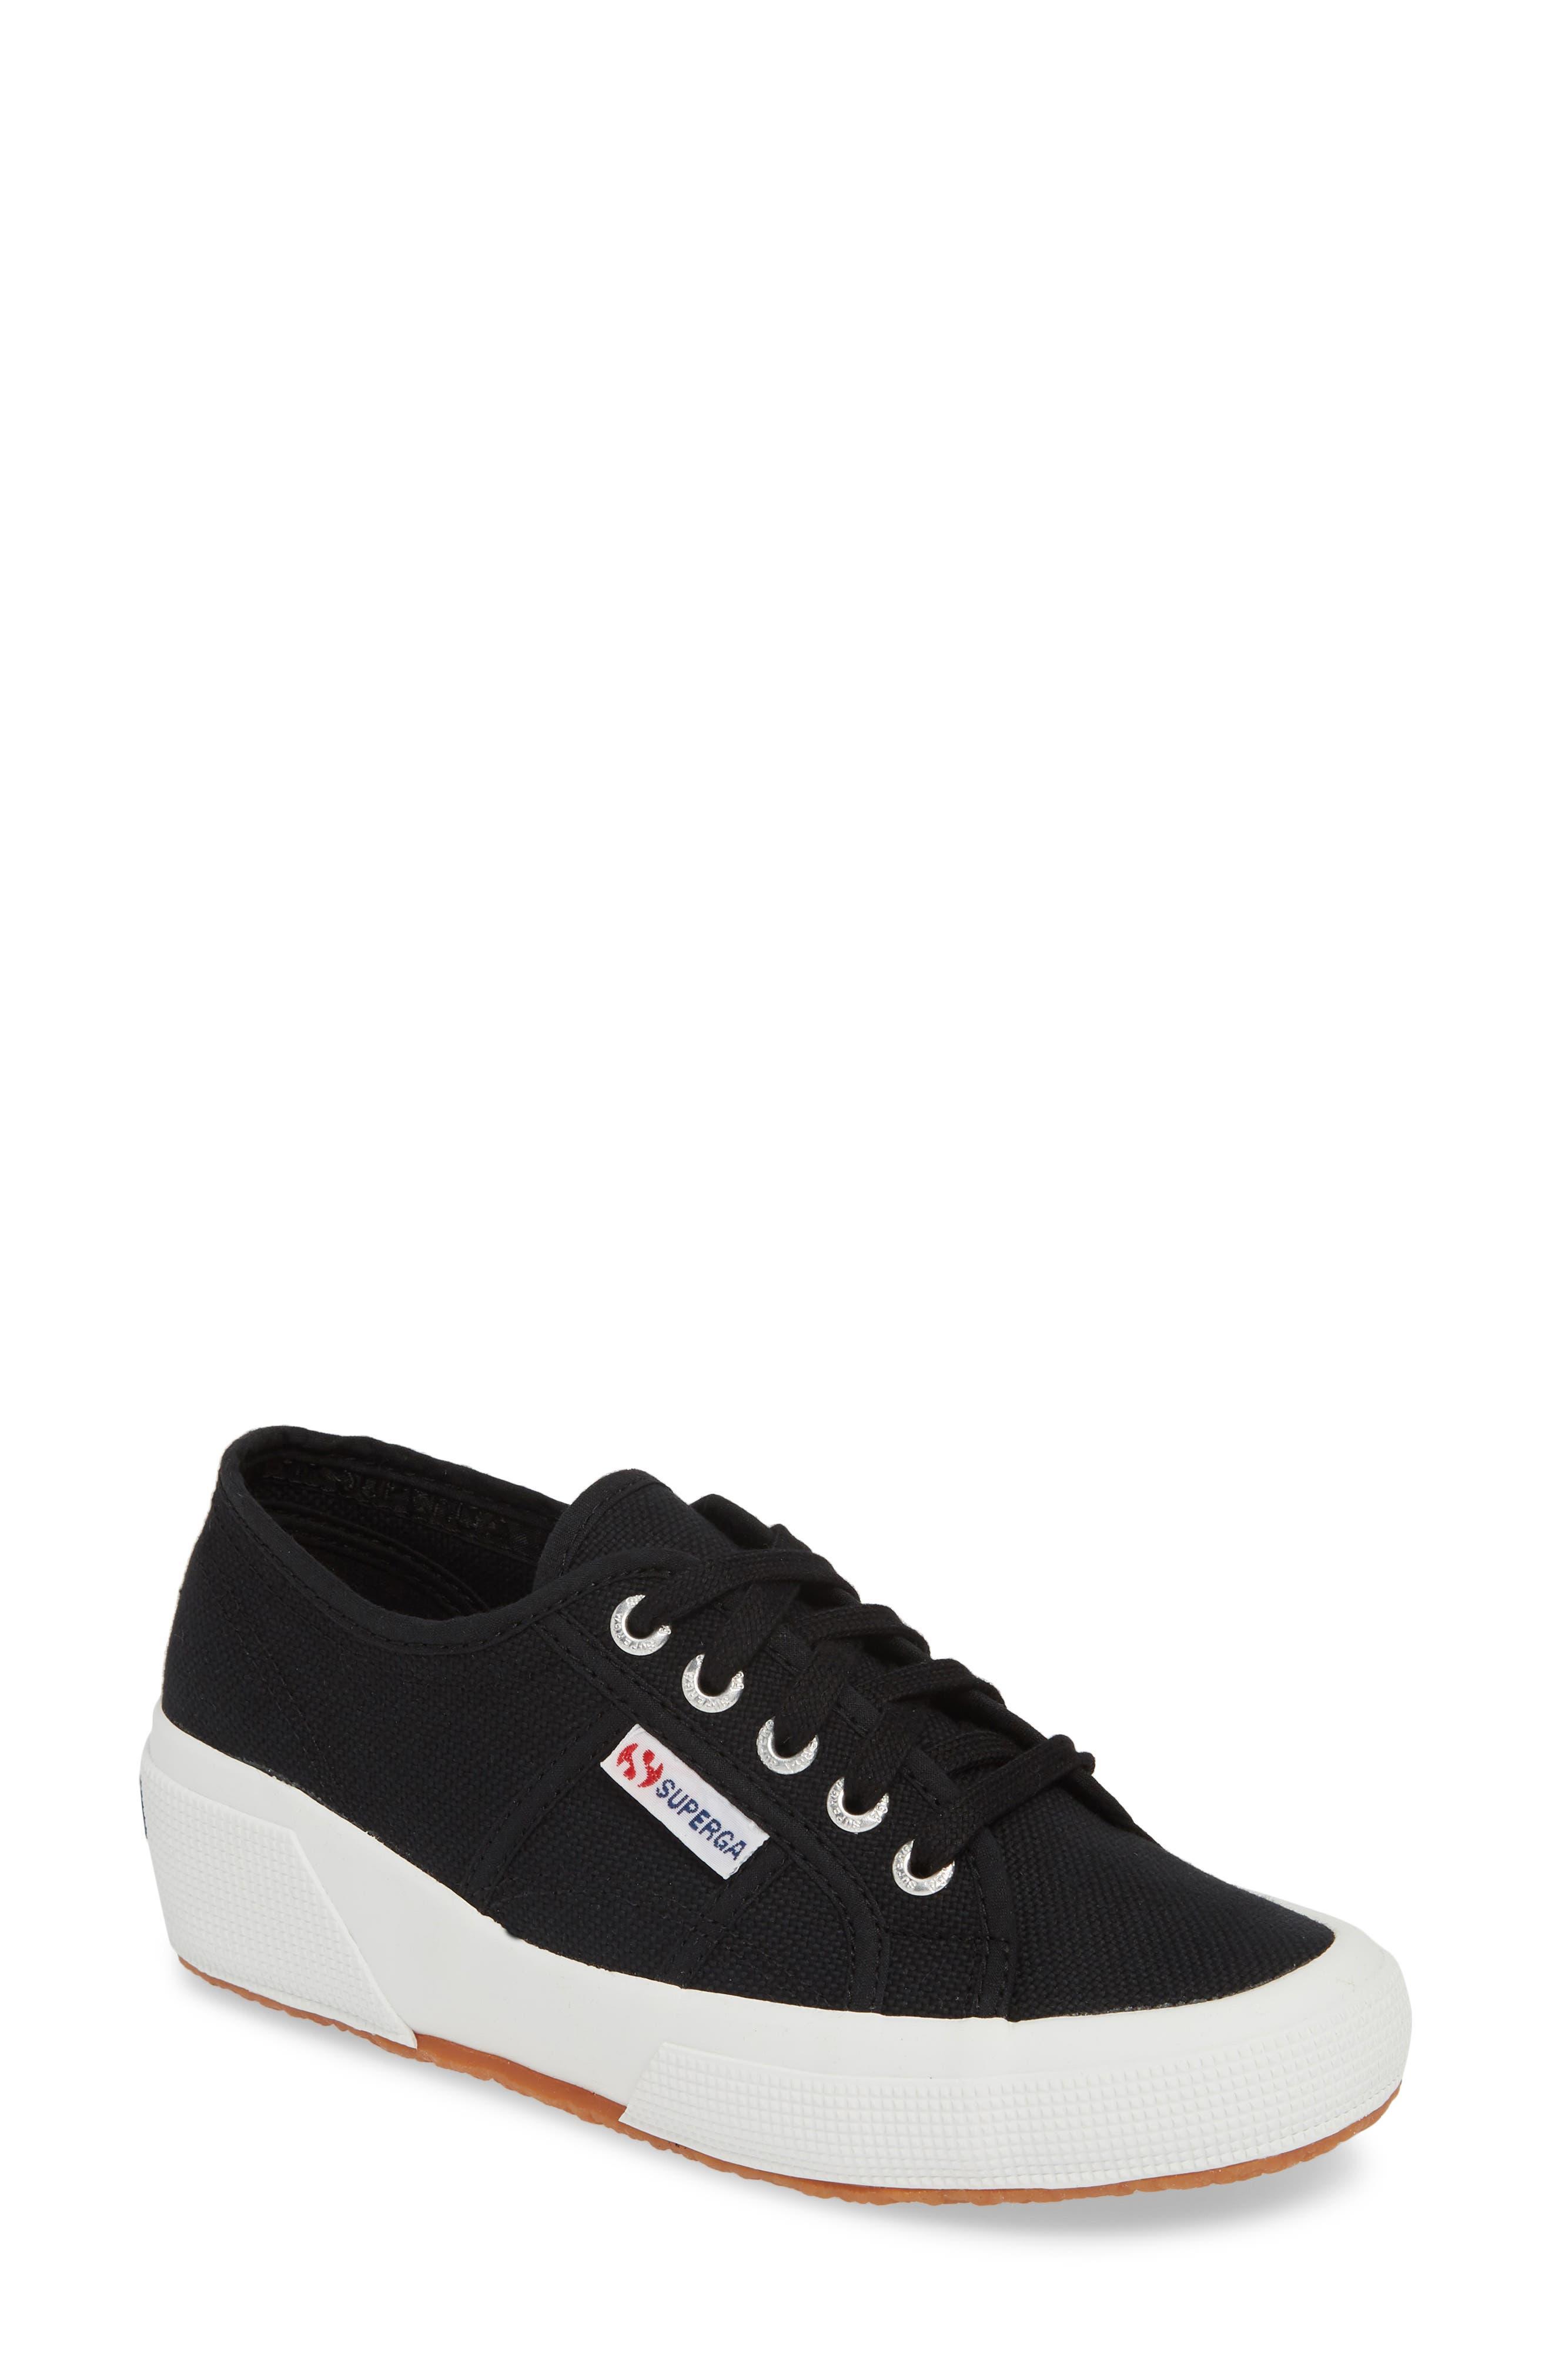 SUPERGA,                             'Linea' Wedge Sneaker,                             Main thumbnail 1, color,                             BLACK / WHITE